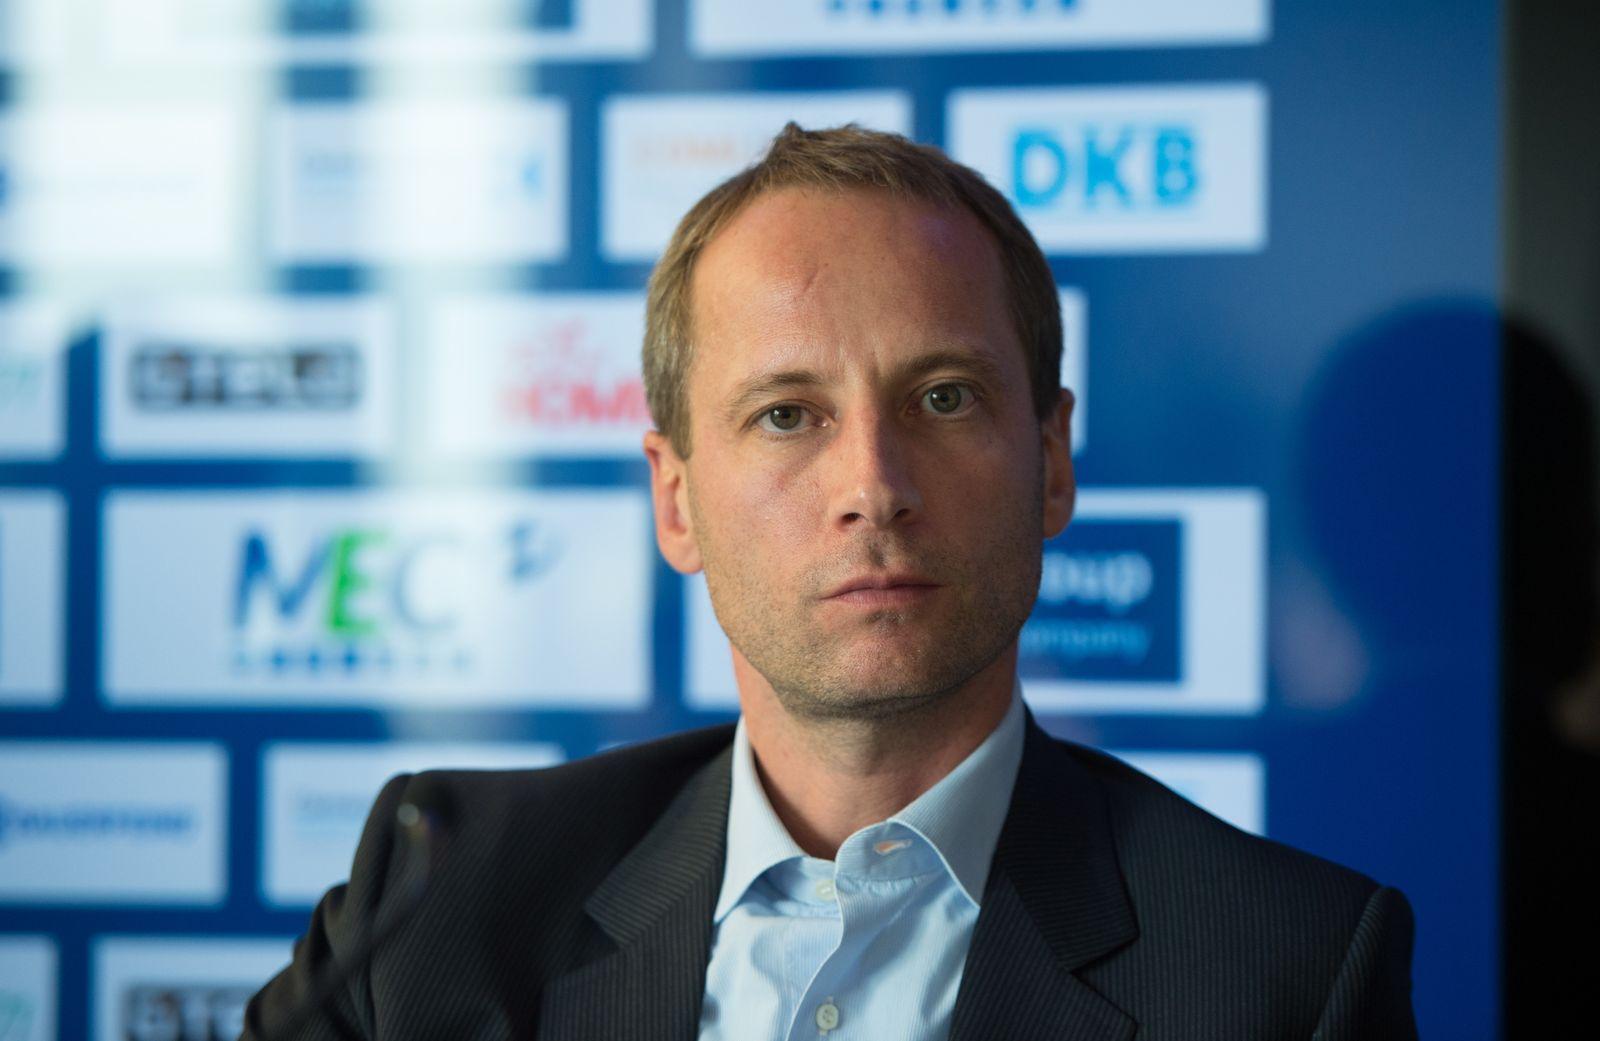 Pressekonferenz ALBA Berlin